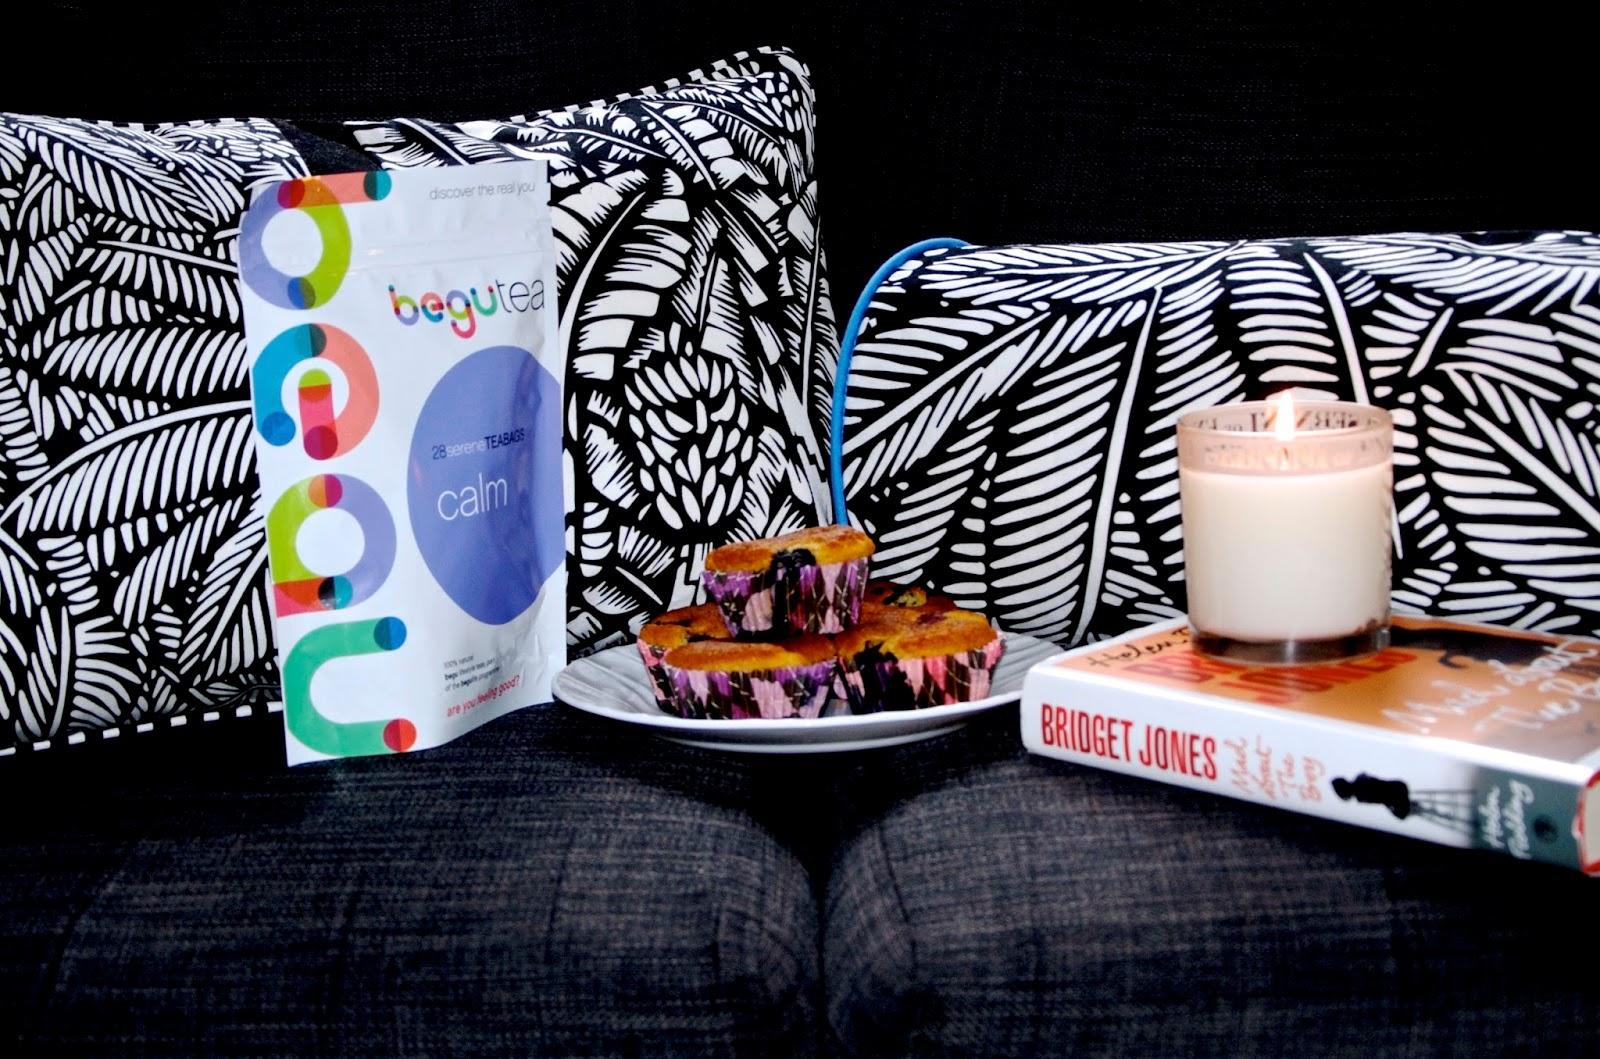 leaf print cushions, tea, blueberry muffins, bridget jones book, candle